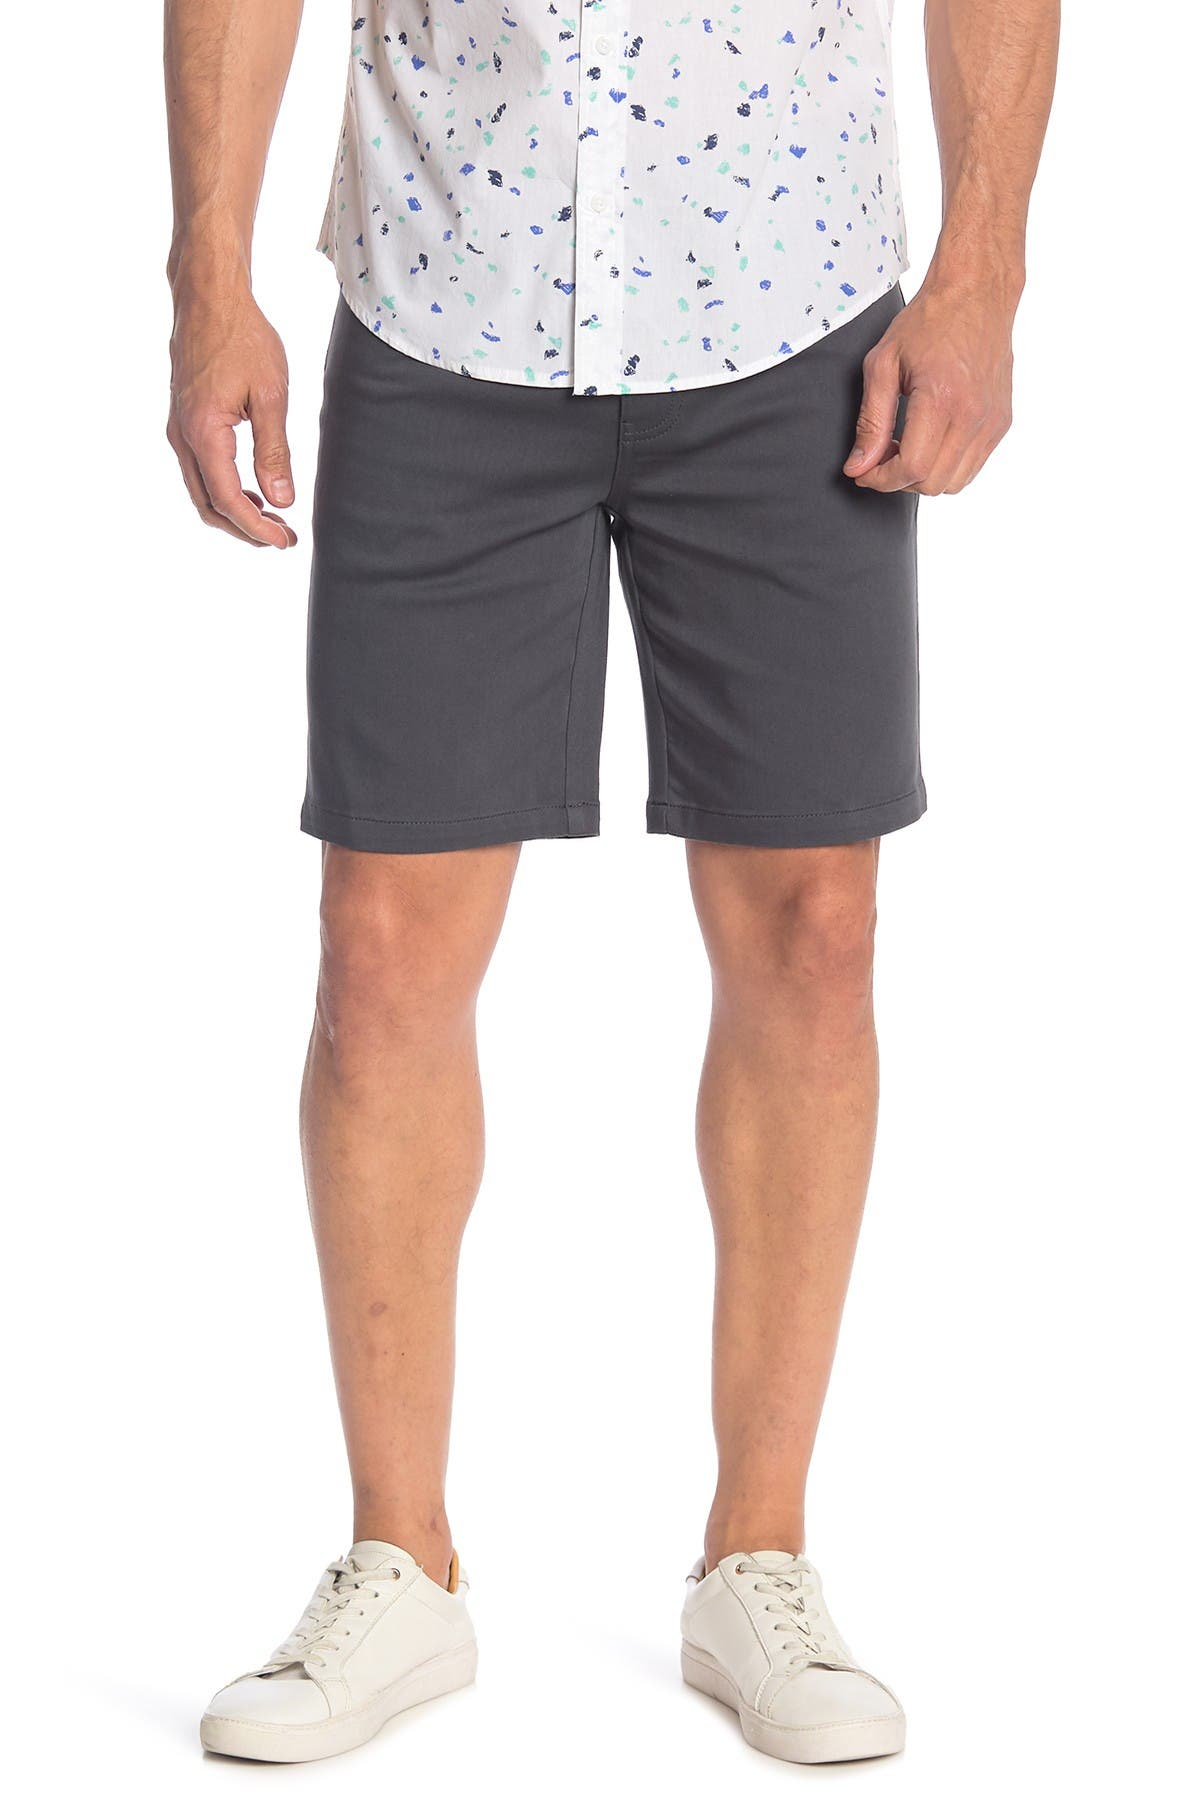 Image of Public Opinion 5 Pocket Stretch Shorts